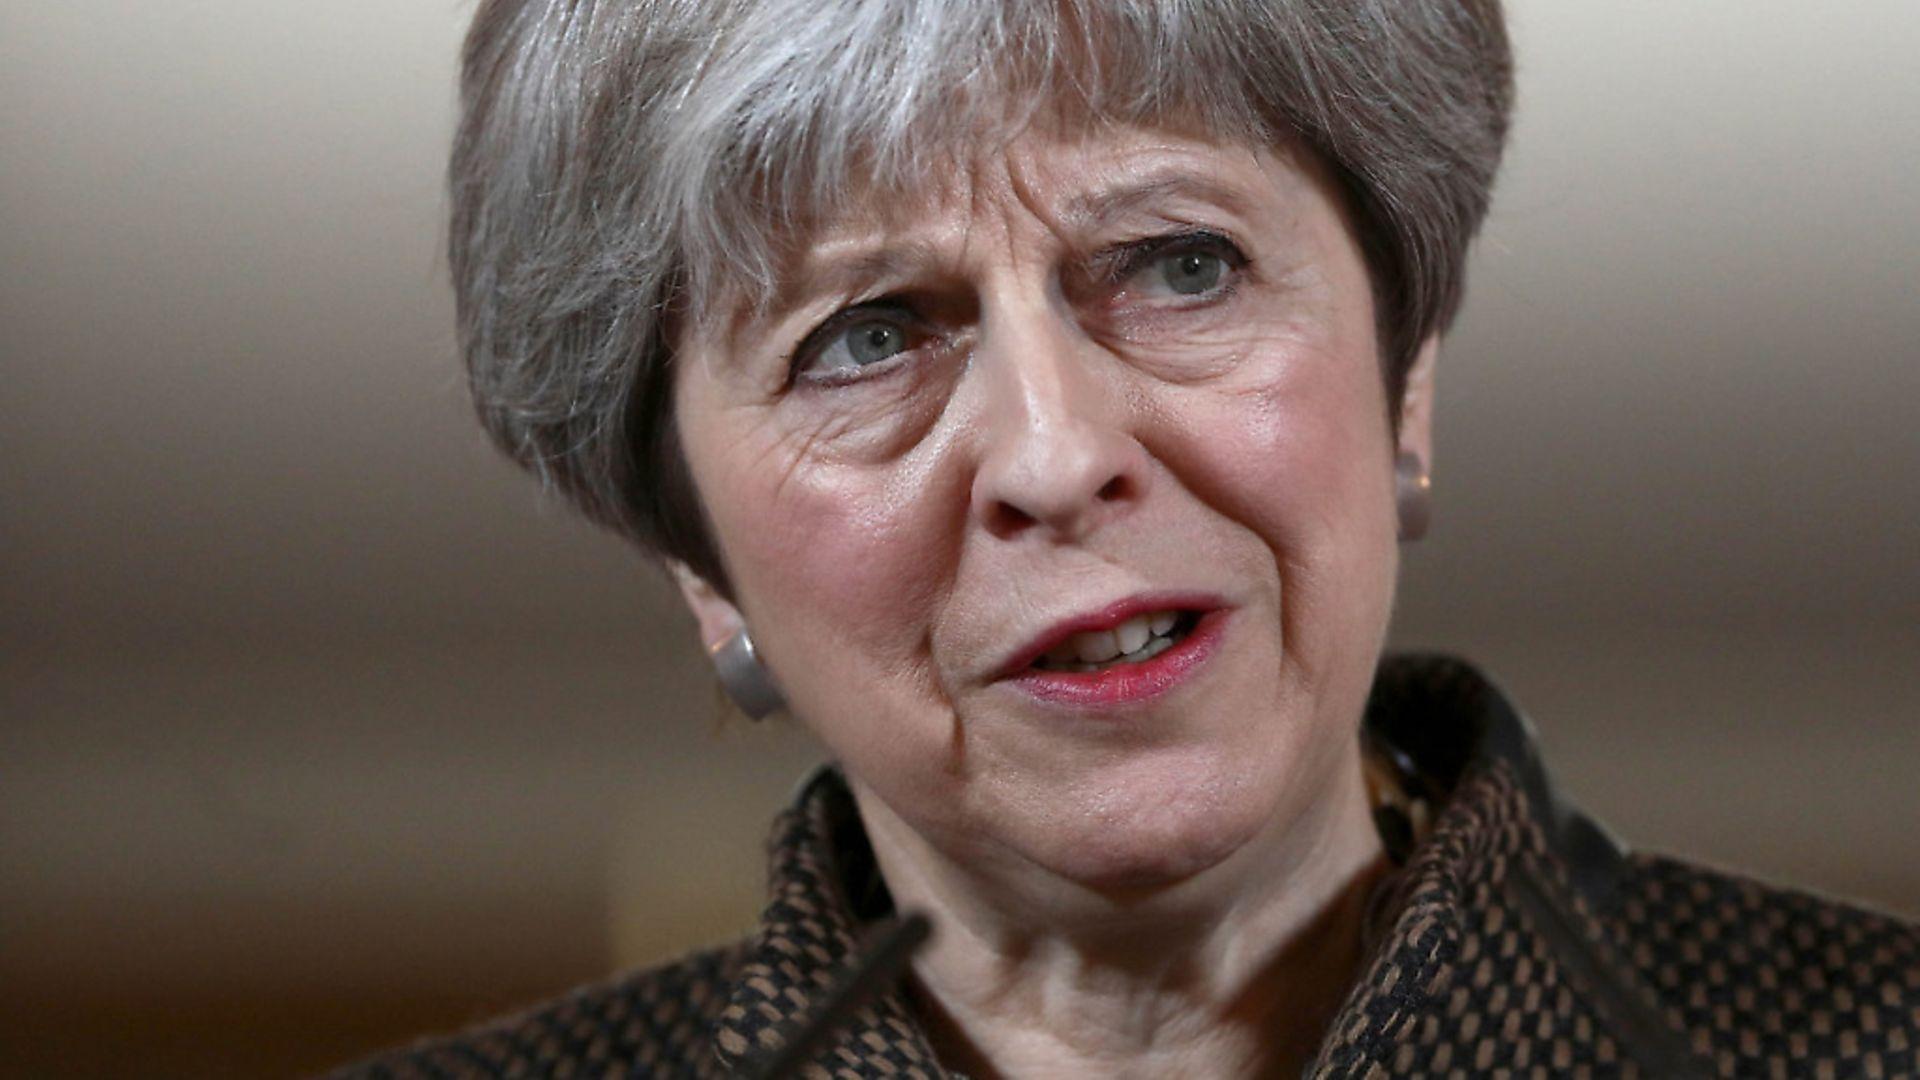 Prime Minister Theresa May. Photograph: Simon Dawson/PA Wire - Credit: PA